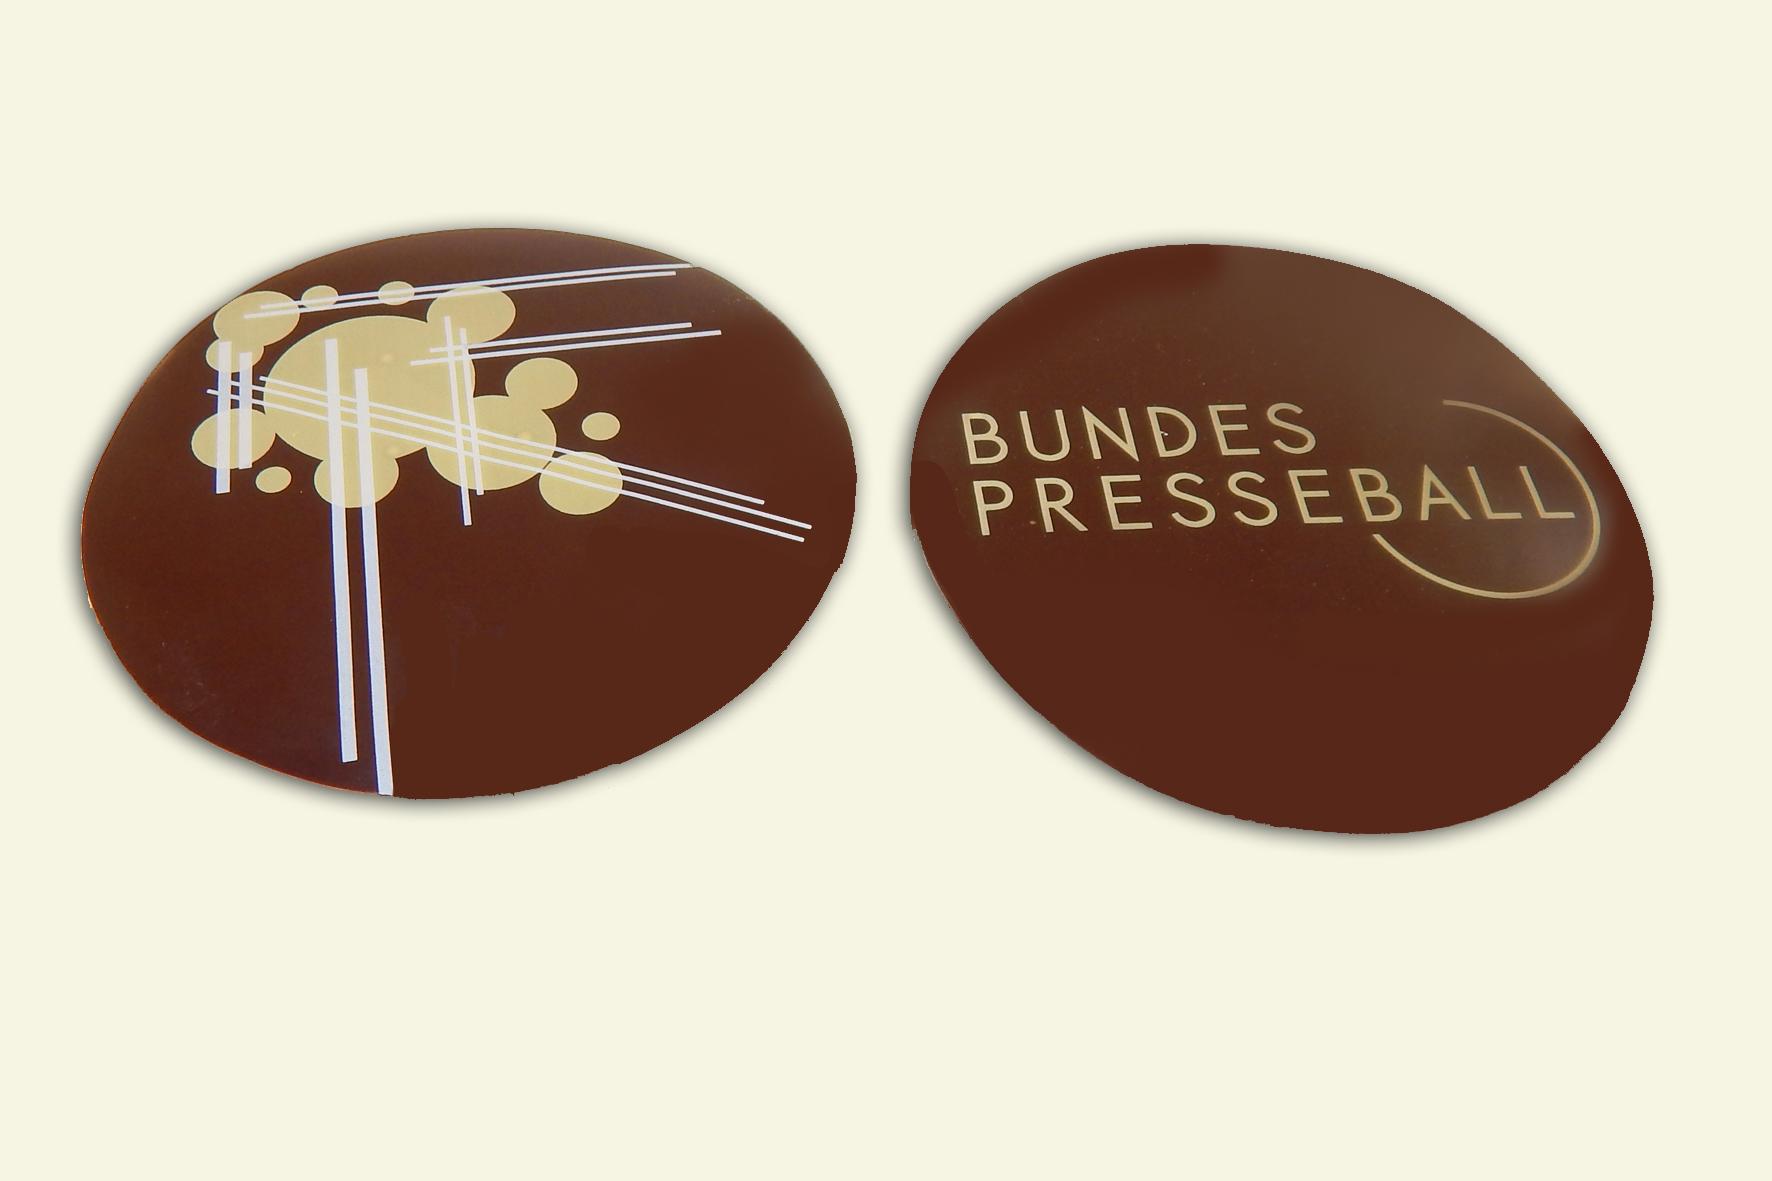 Bundespresseball